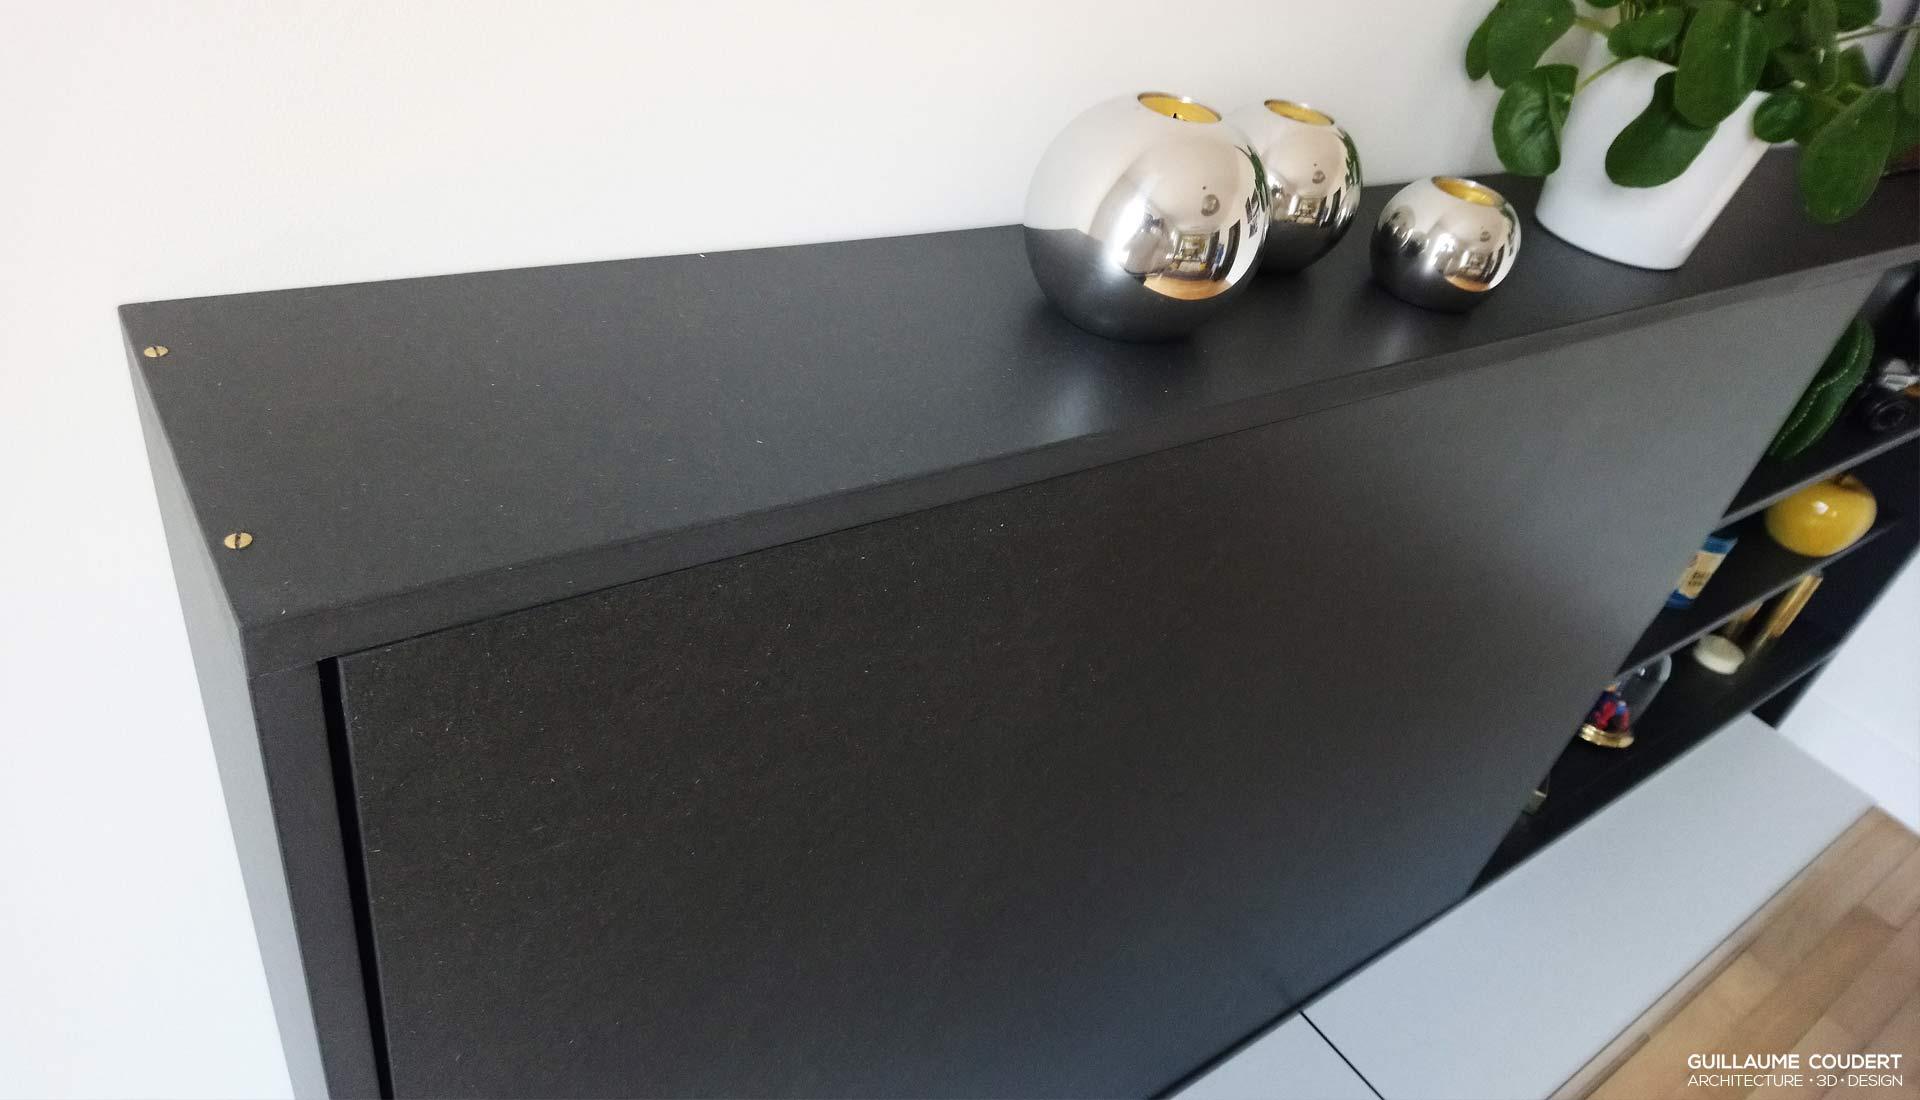 meuble tv guillaume coudert architecture d 39 int rieur. Black Bedroom Furniture Sets. Home Design Ideas